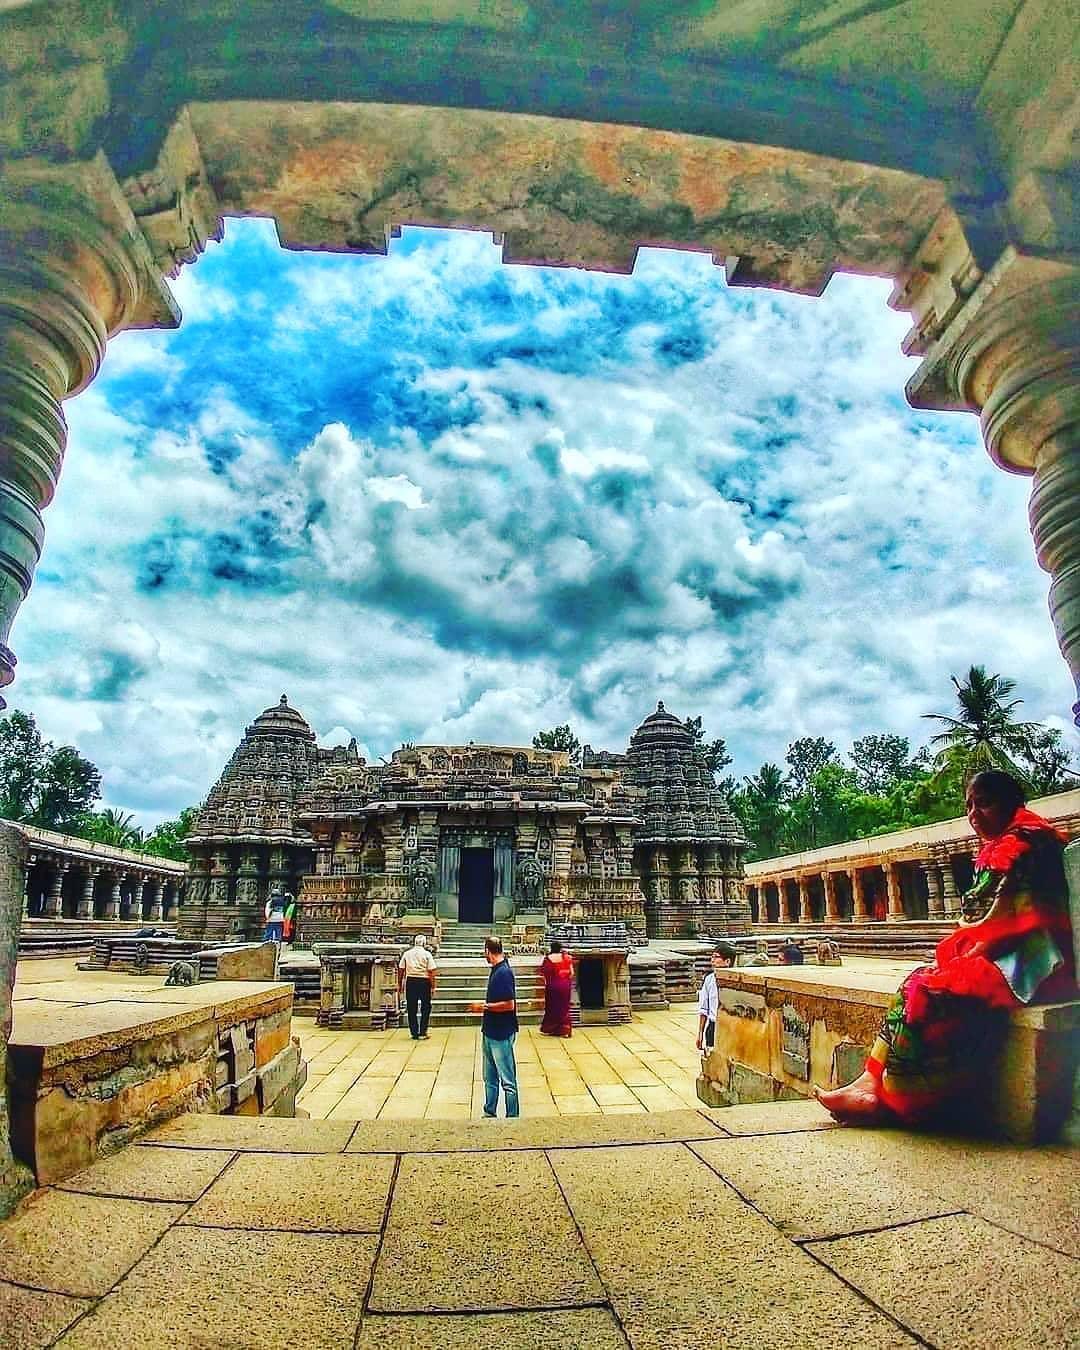 #lost #temple #temples #losttemple #losttemples #lost_temples #ancient #ancestor...